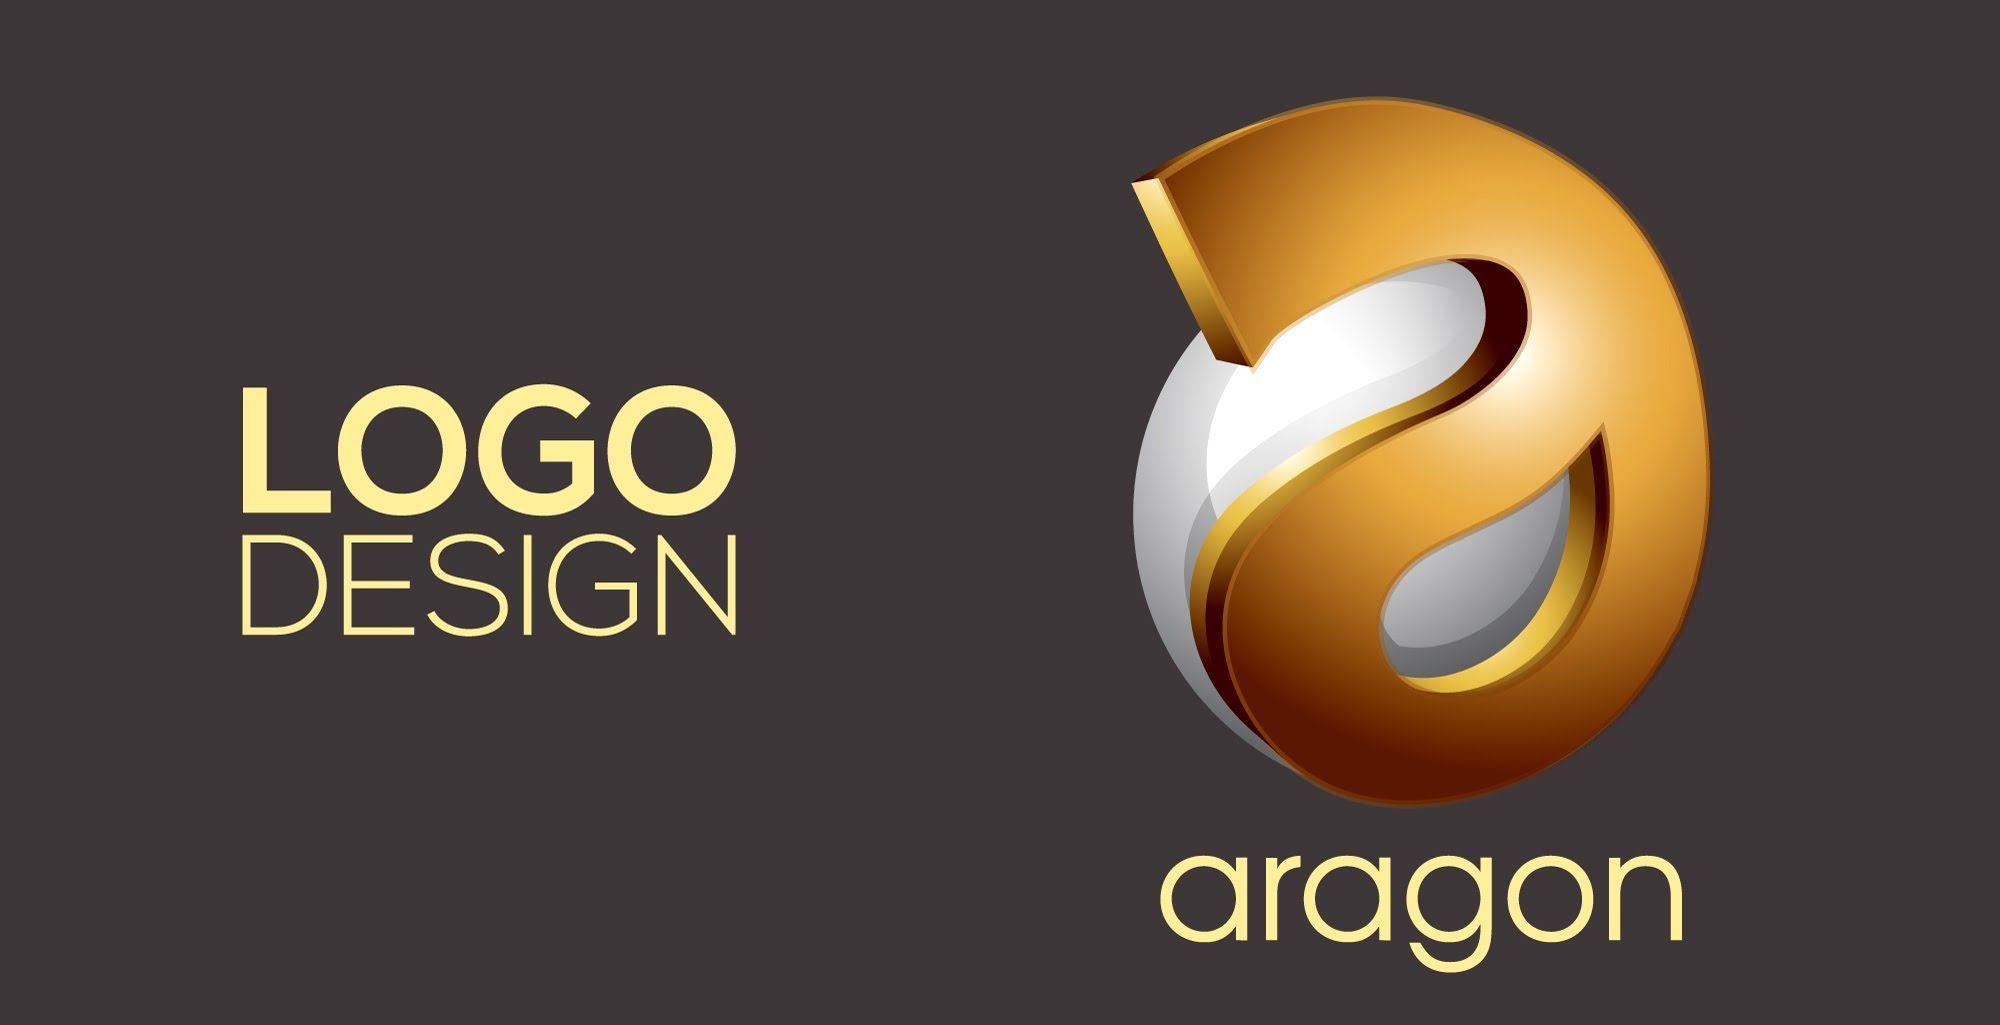 Professional Logo Design - Adobe Illustrator cs6 (Aragon)